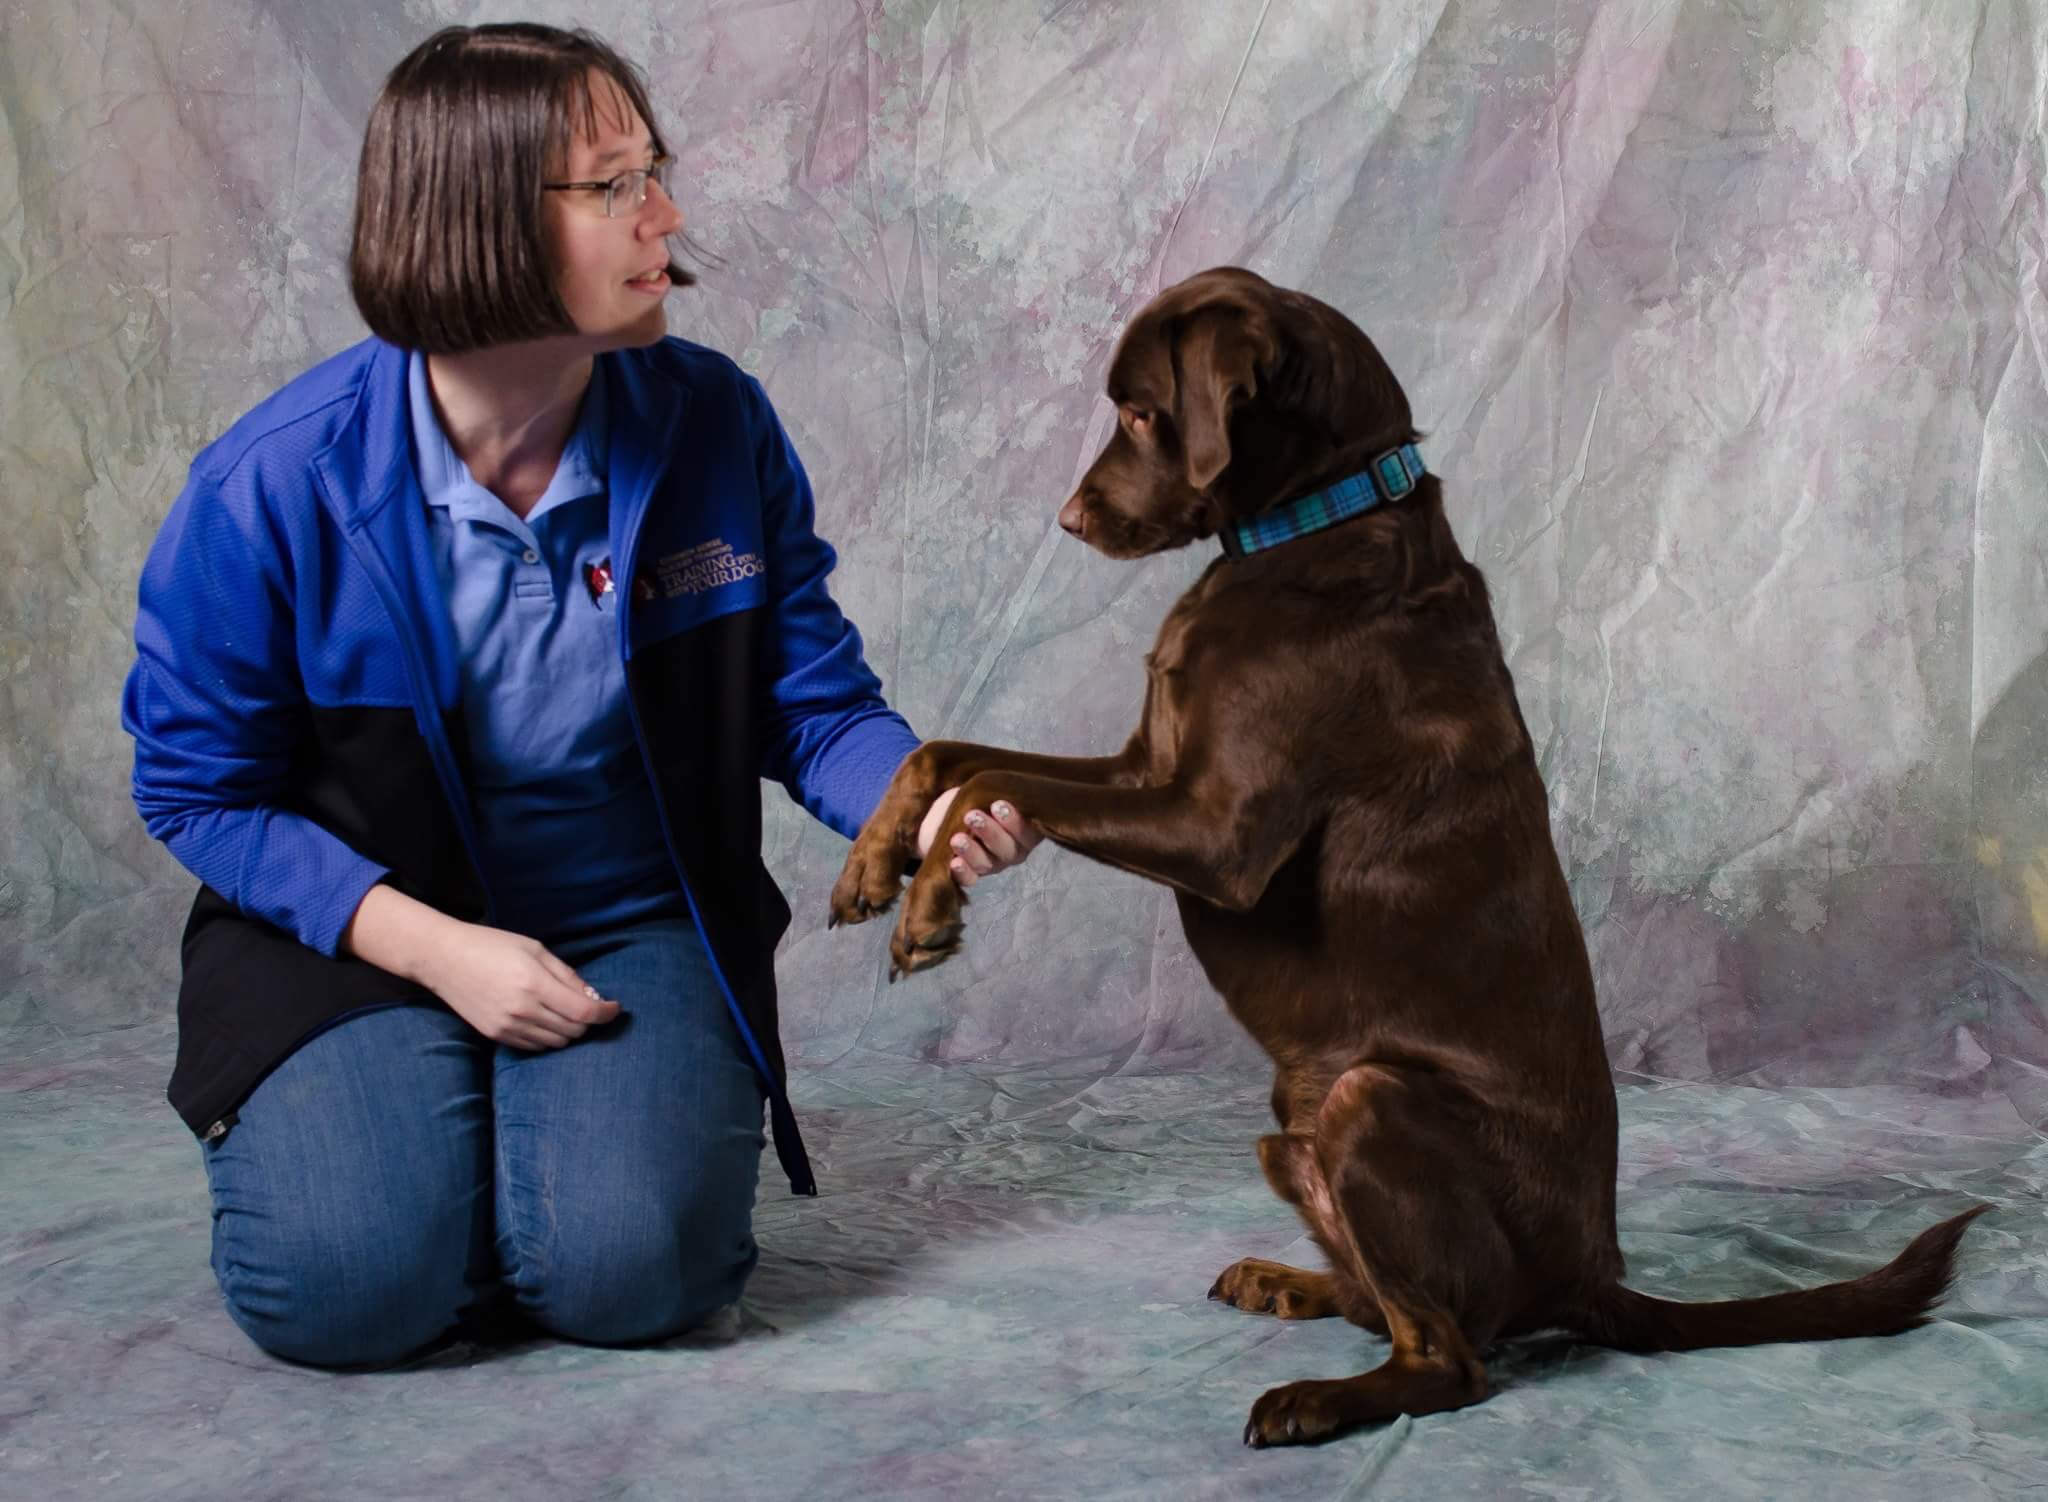 Sidney Ocheltree, CPDT-KA certified professional dog trainer in Redmond, Bellevue, Sammamish, Kirkland, Medina and Issaquah, WA. Uses positive reinforcement dog training.